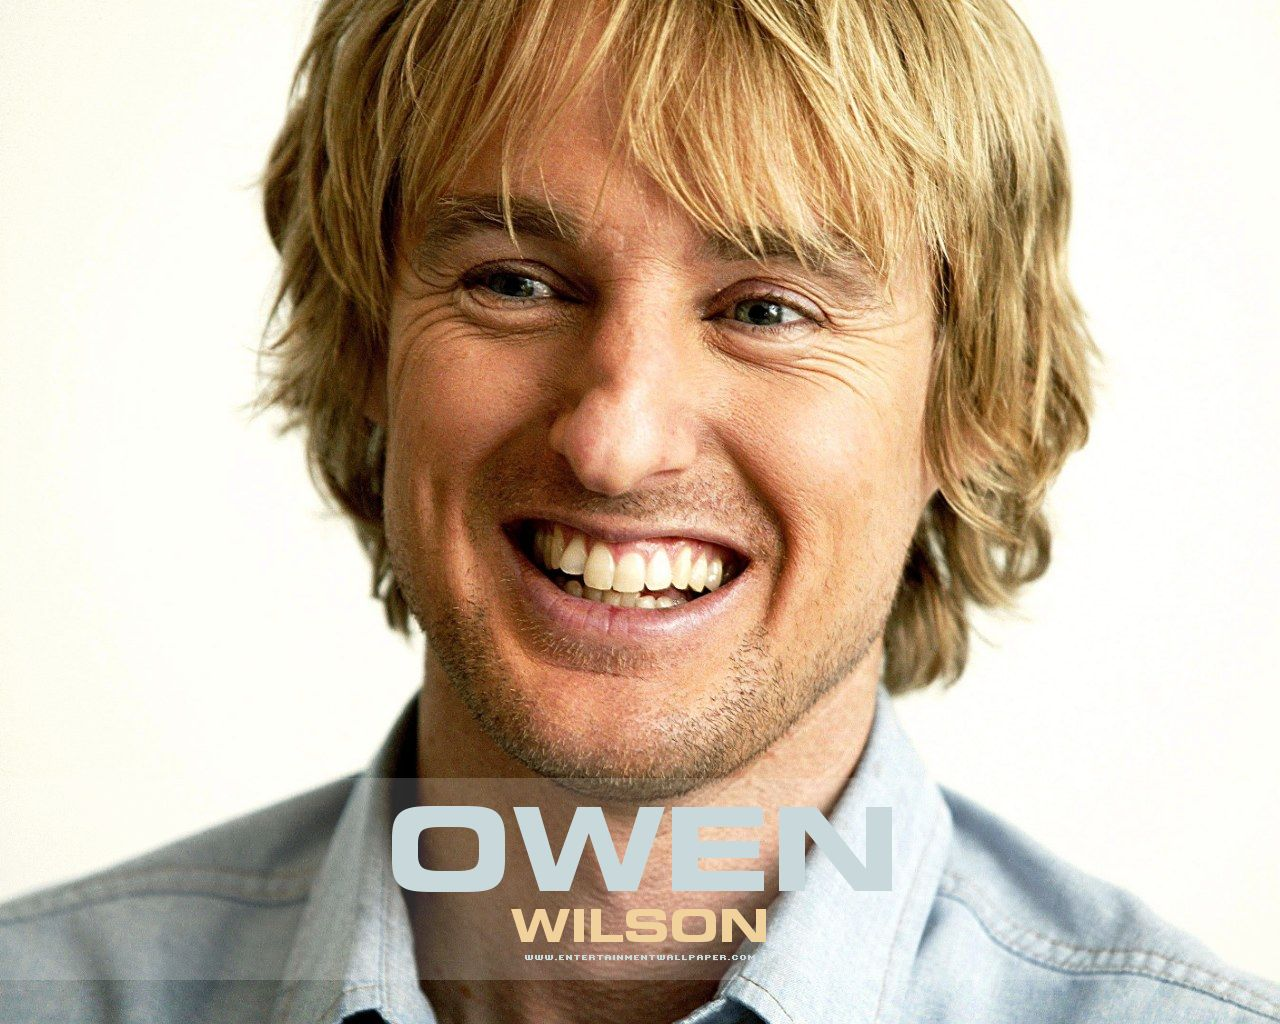 http://3.bp.blogspot.com/-LXz-GwJbglE/T0oH15oEPCI/AAAAAAAAHIw/mFhTJV6g0Lk/s1600/Owen+Wilson-Wallpapers-1.jpg